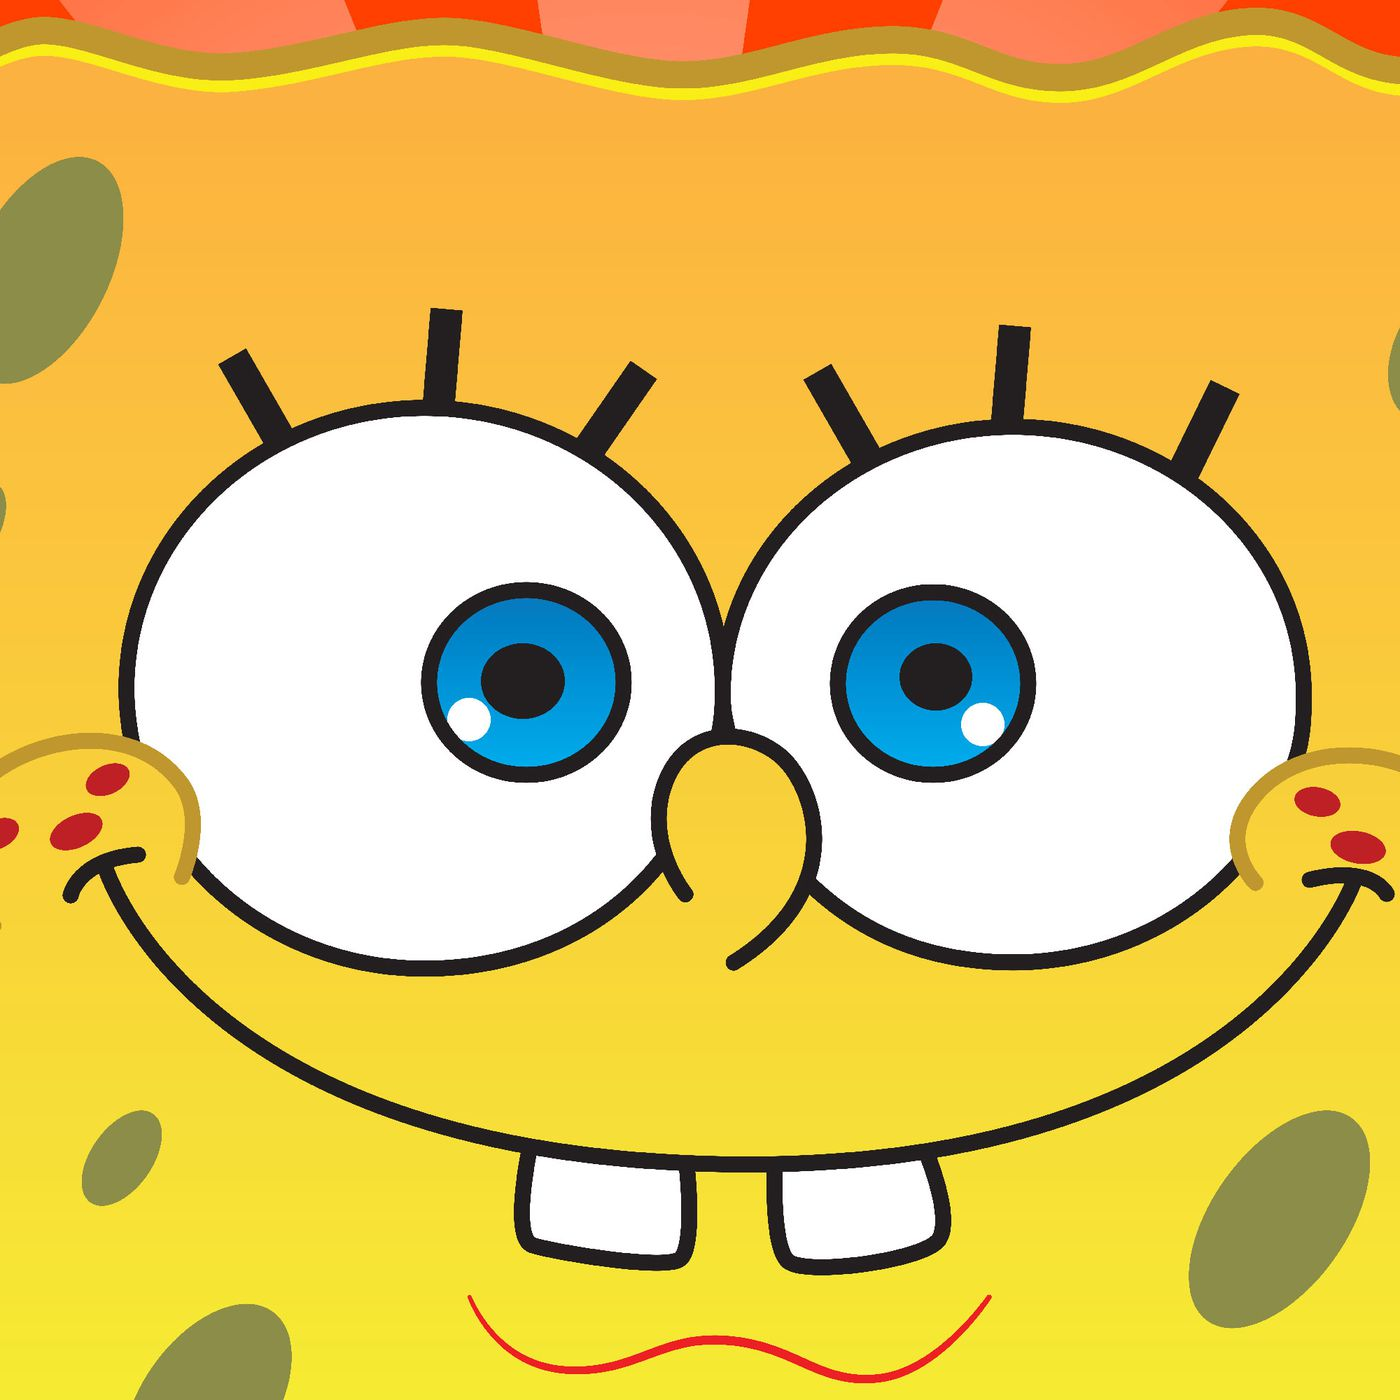 The greatness of stephen hillenburg and spongebob squarepants the ringer